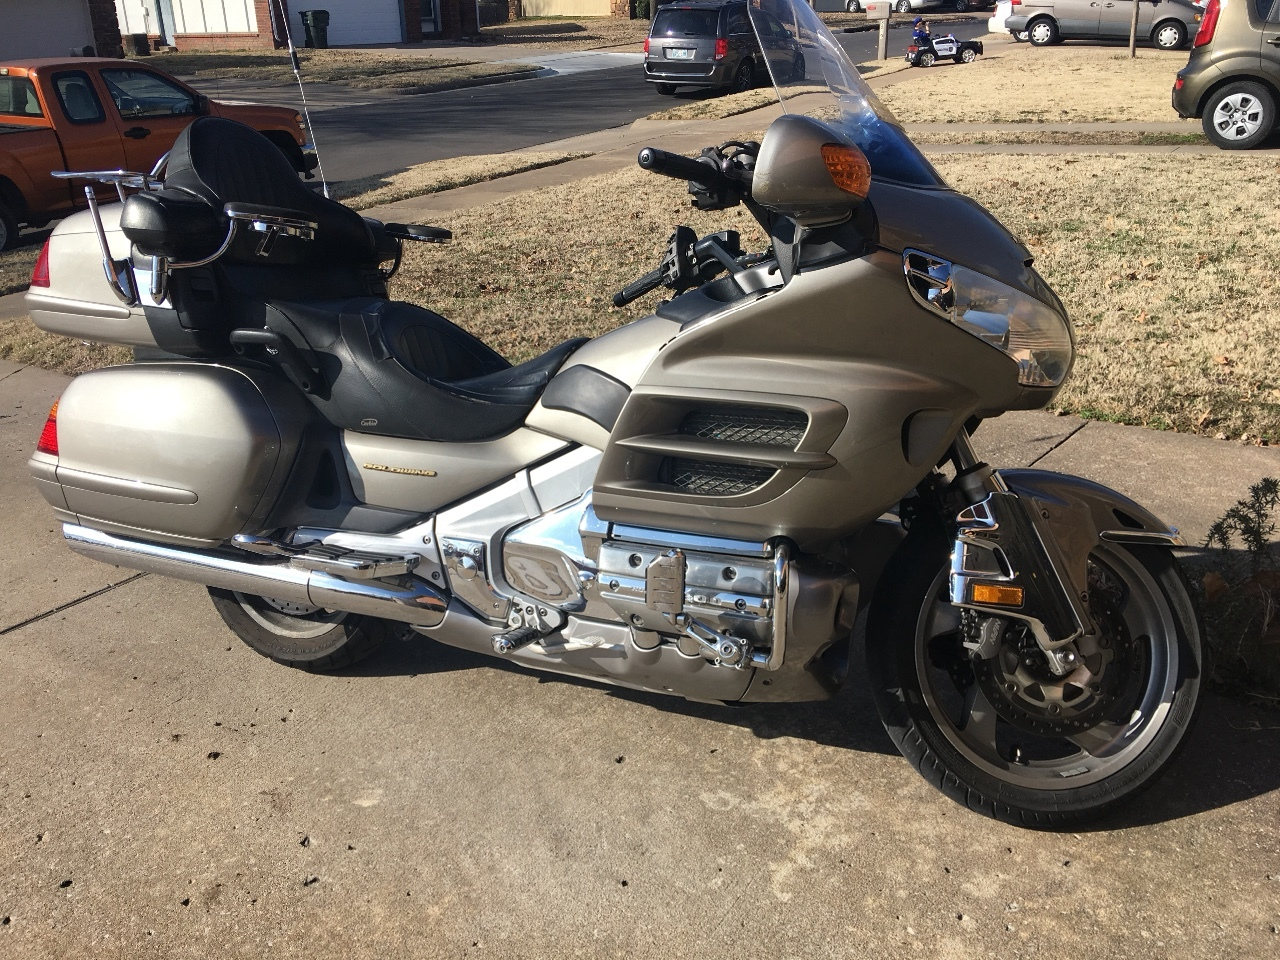 Oklahoma - Honda For Sale - Honda Motorcycle,Trailers - PWC